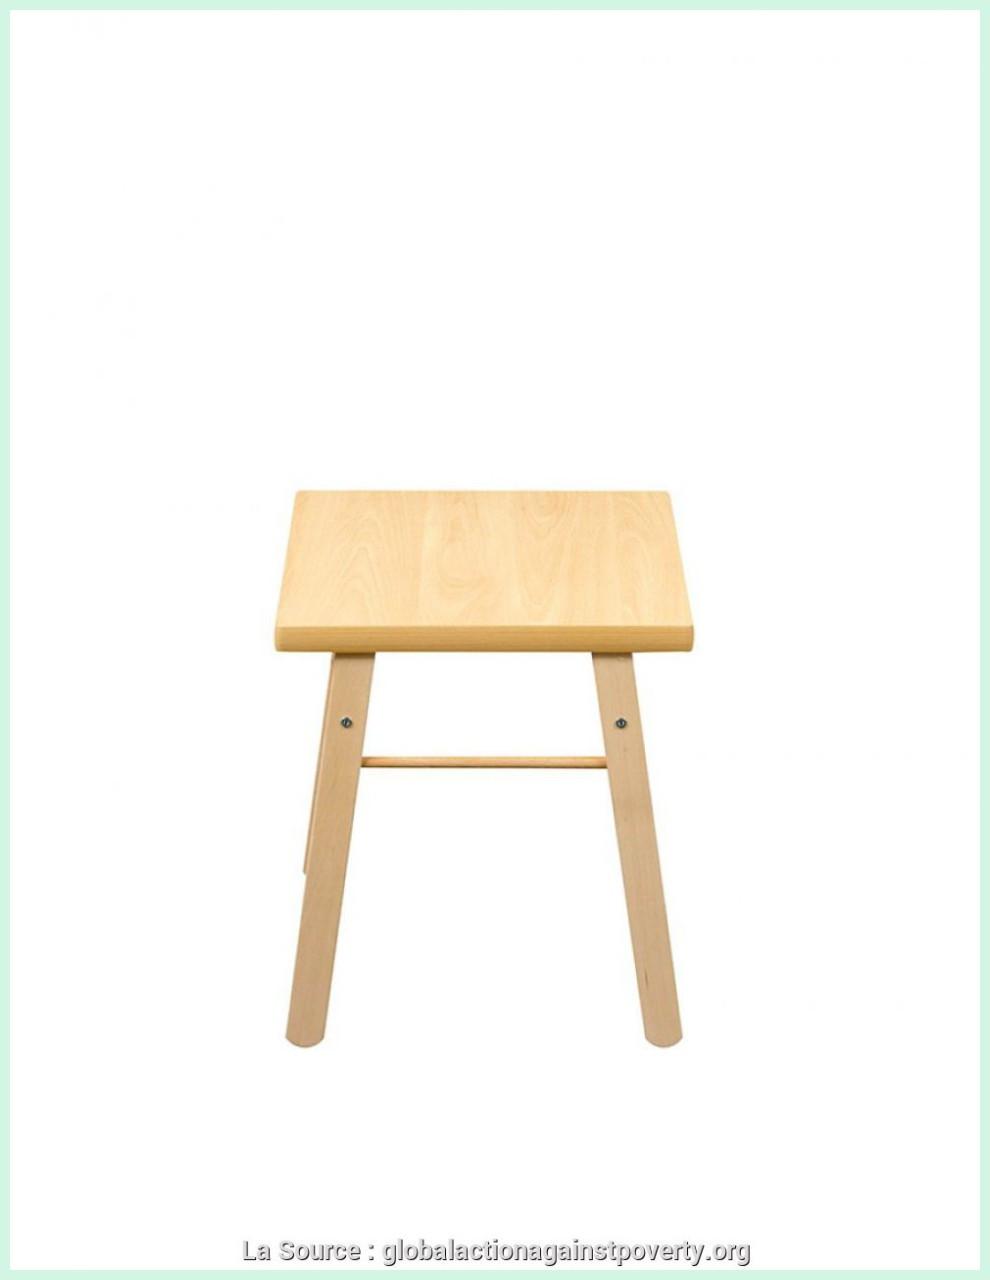 meuble console i agreable table basse se leve i table de chevet scandinave i of meuble console i 1